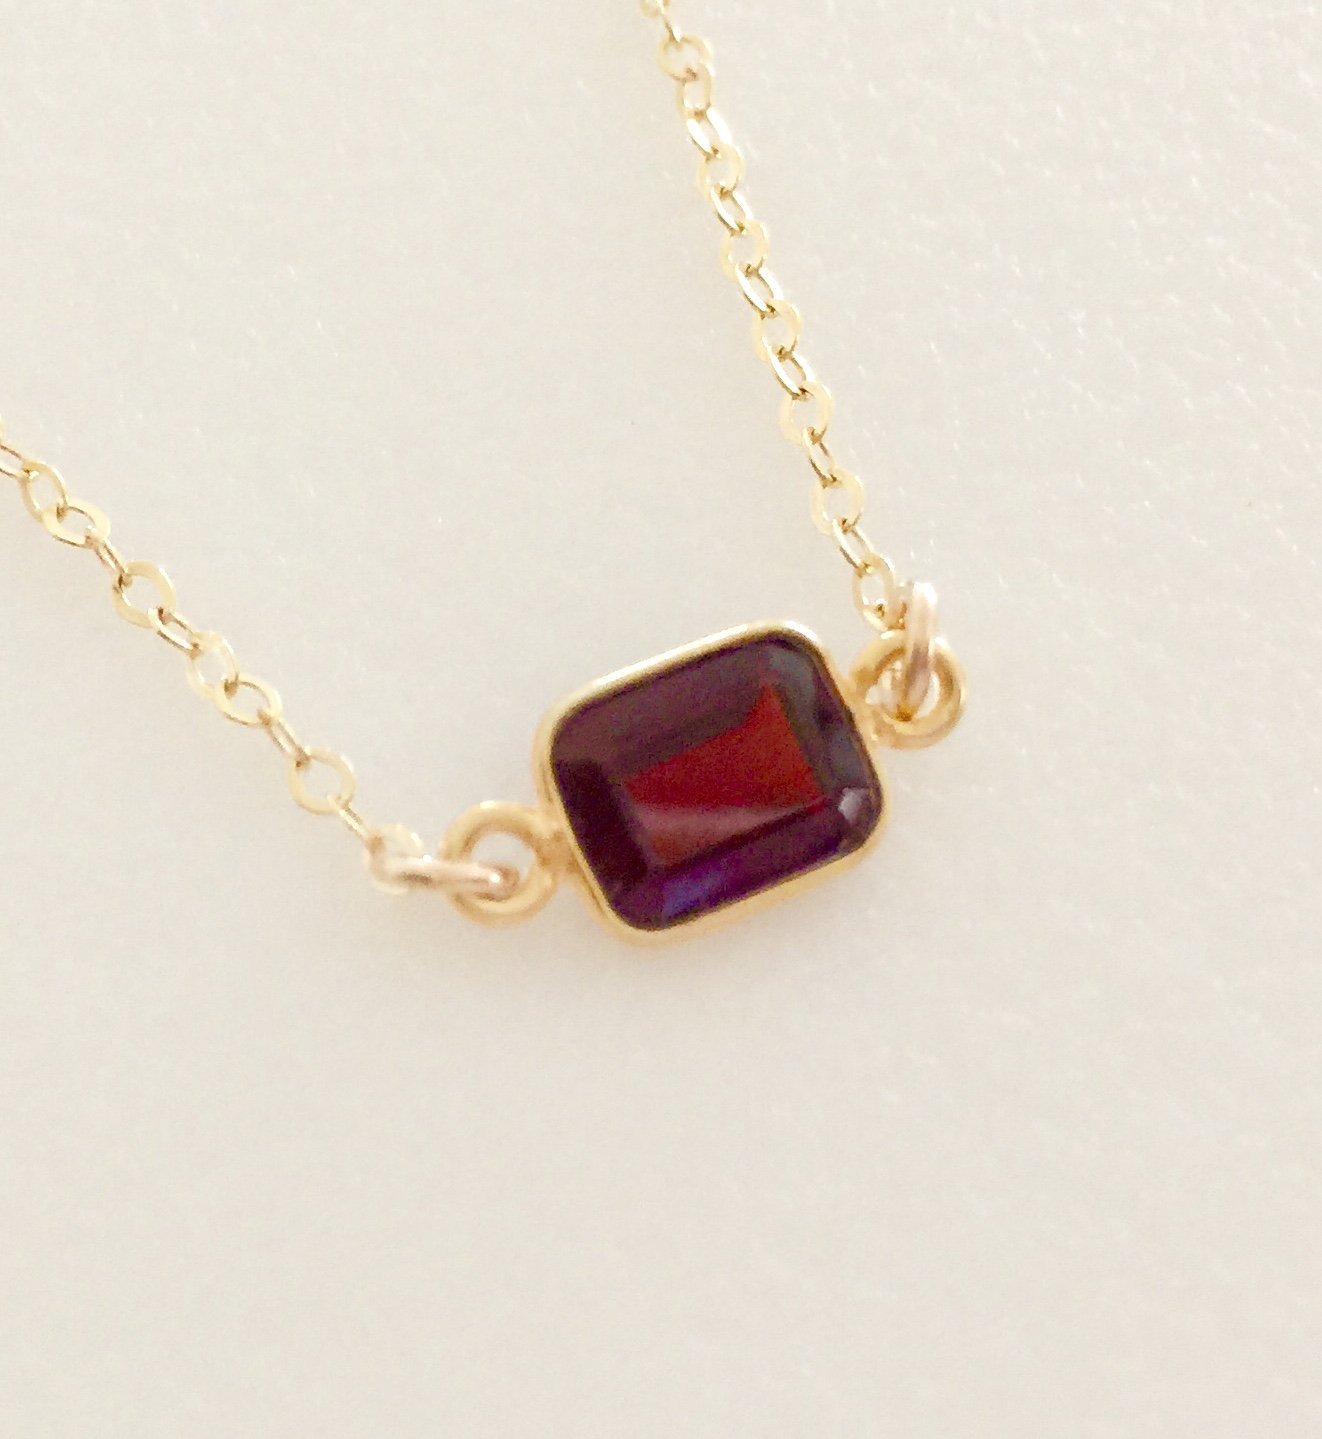 Nuit  Delicate garnet necklace  January birthstone  Dainty gemstone necklace  Garnet Birthstone Beaded necklace